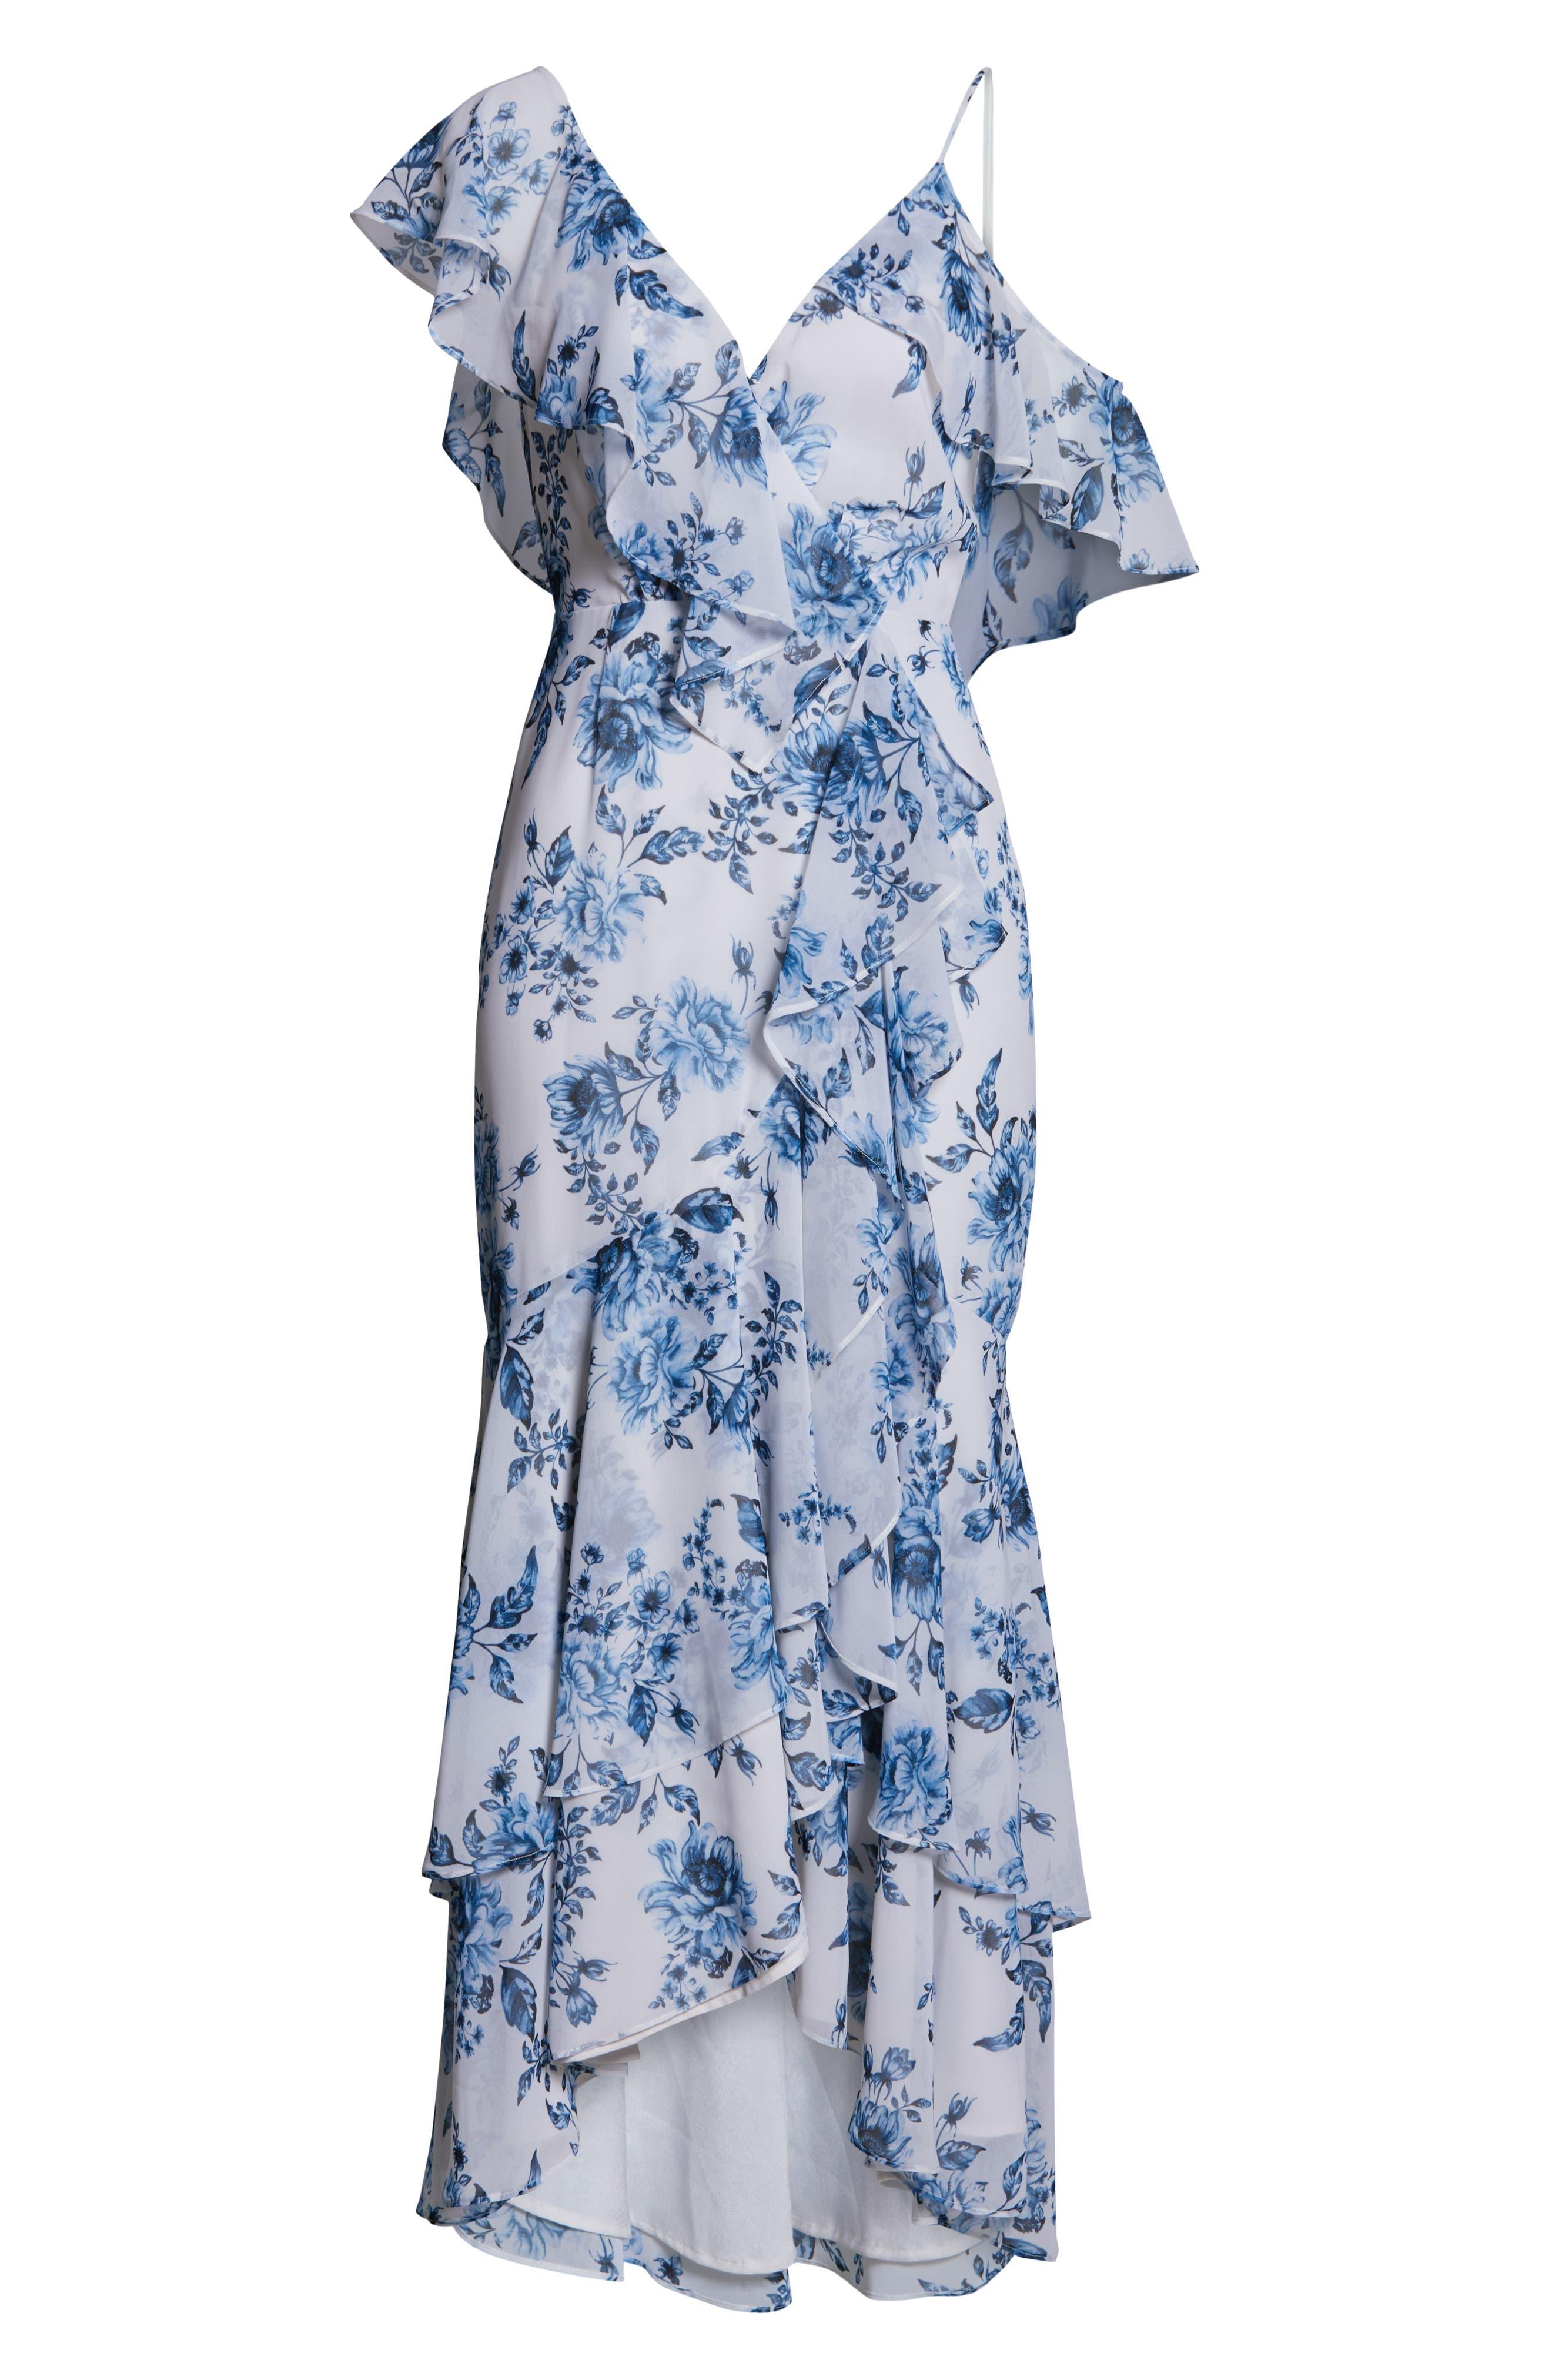 Elanor Ruffle Faux Wrap Maxi Dress,                             Alternate thumbnail 7, color,                             BLUE TOILE FLORAL